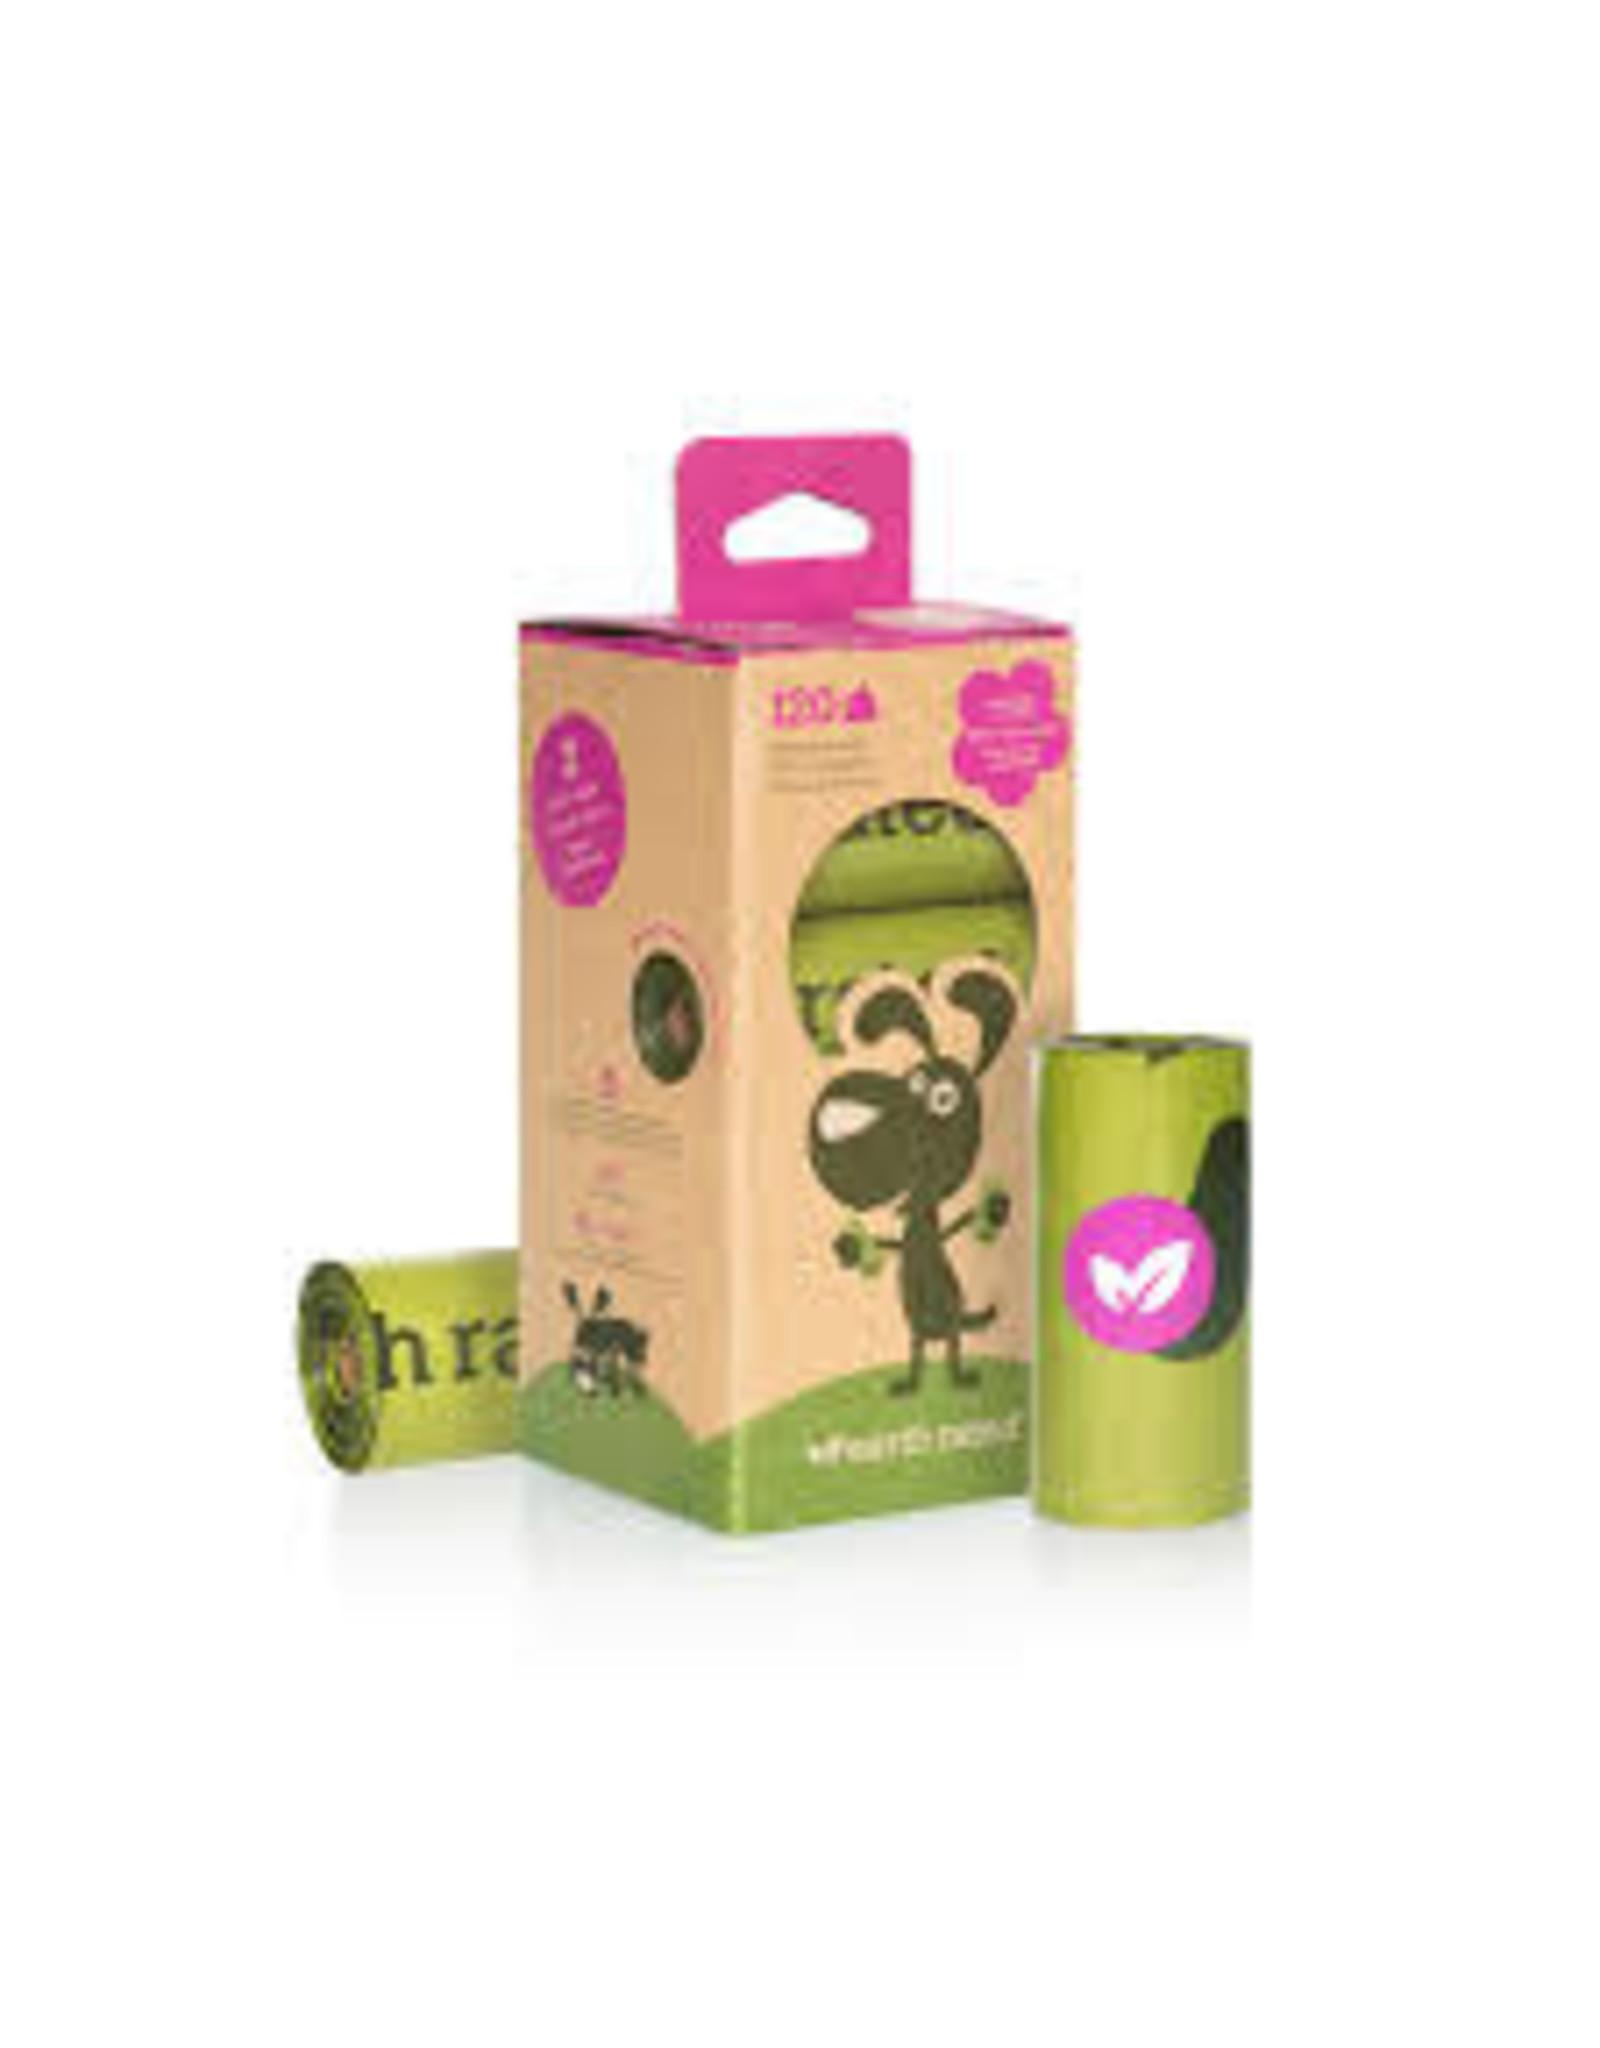 EarthRated Poop Bags: Lavendar Scented, 8 rolls